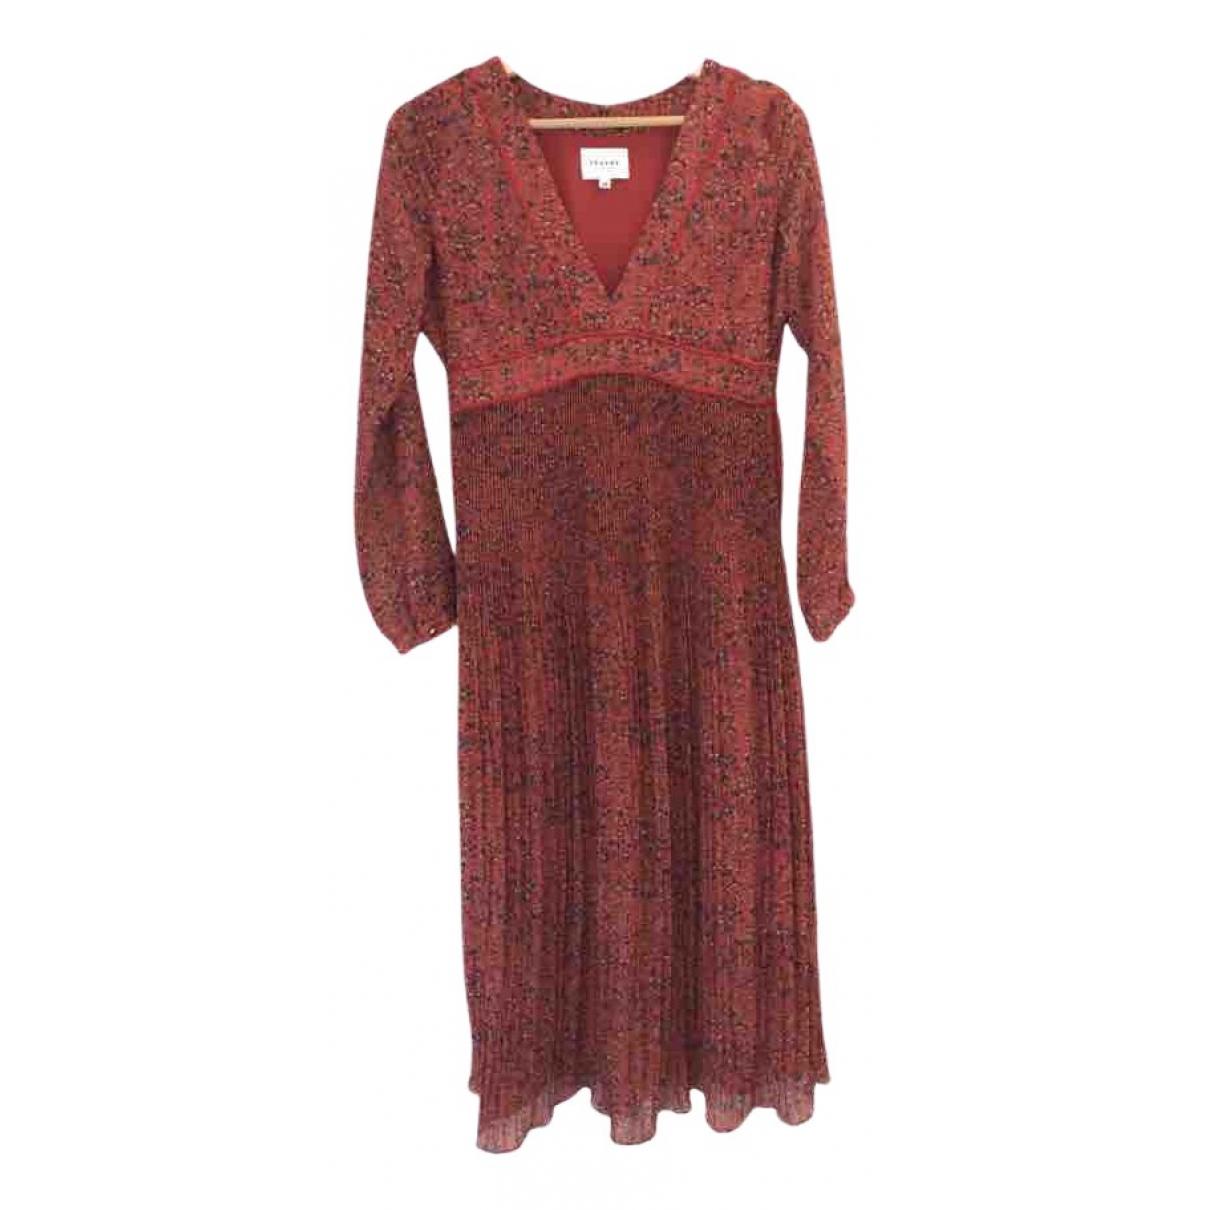 Sezane \N Kleid in  Rot Polyester